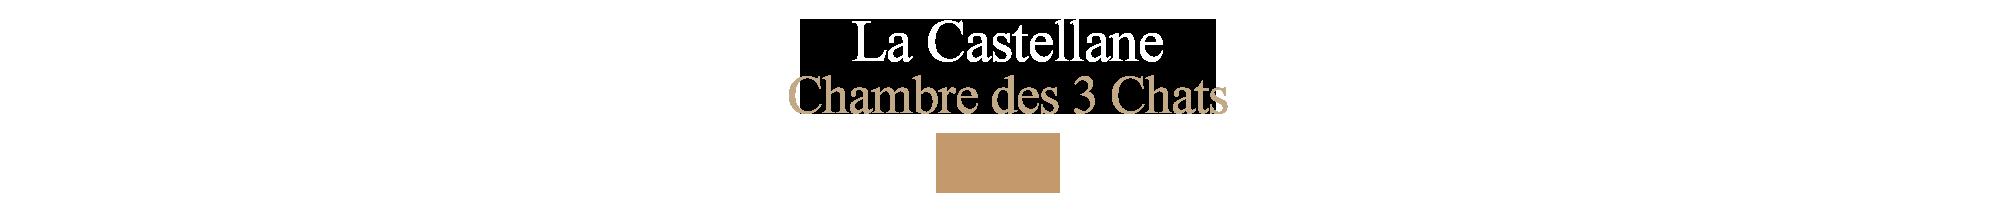 Chambre-des-3-chats-la-Castellane